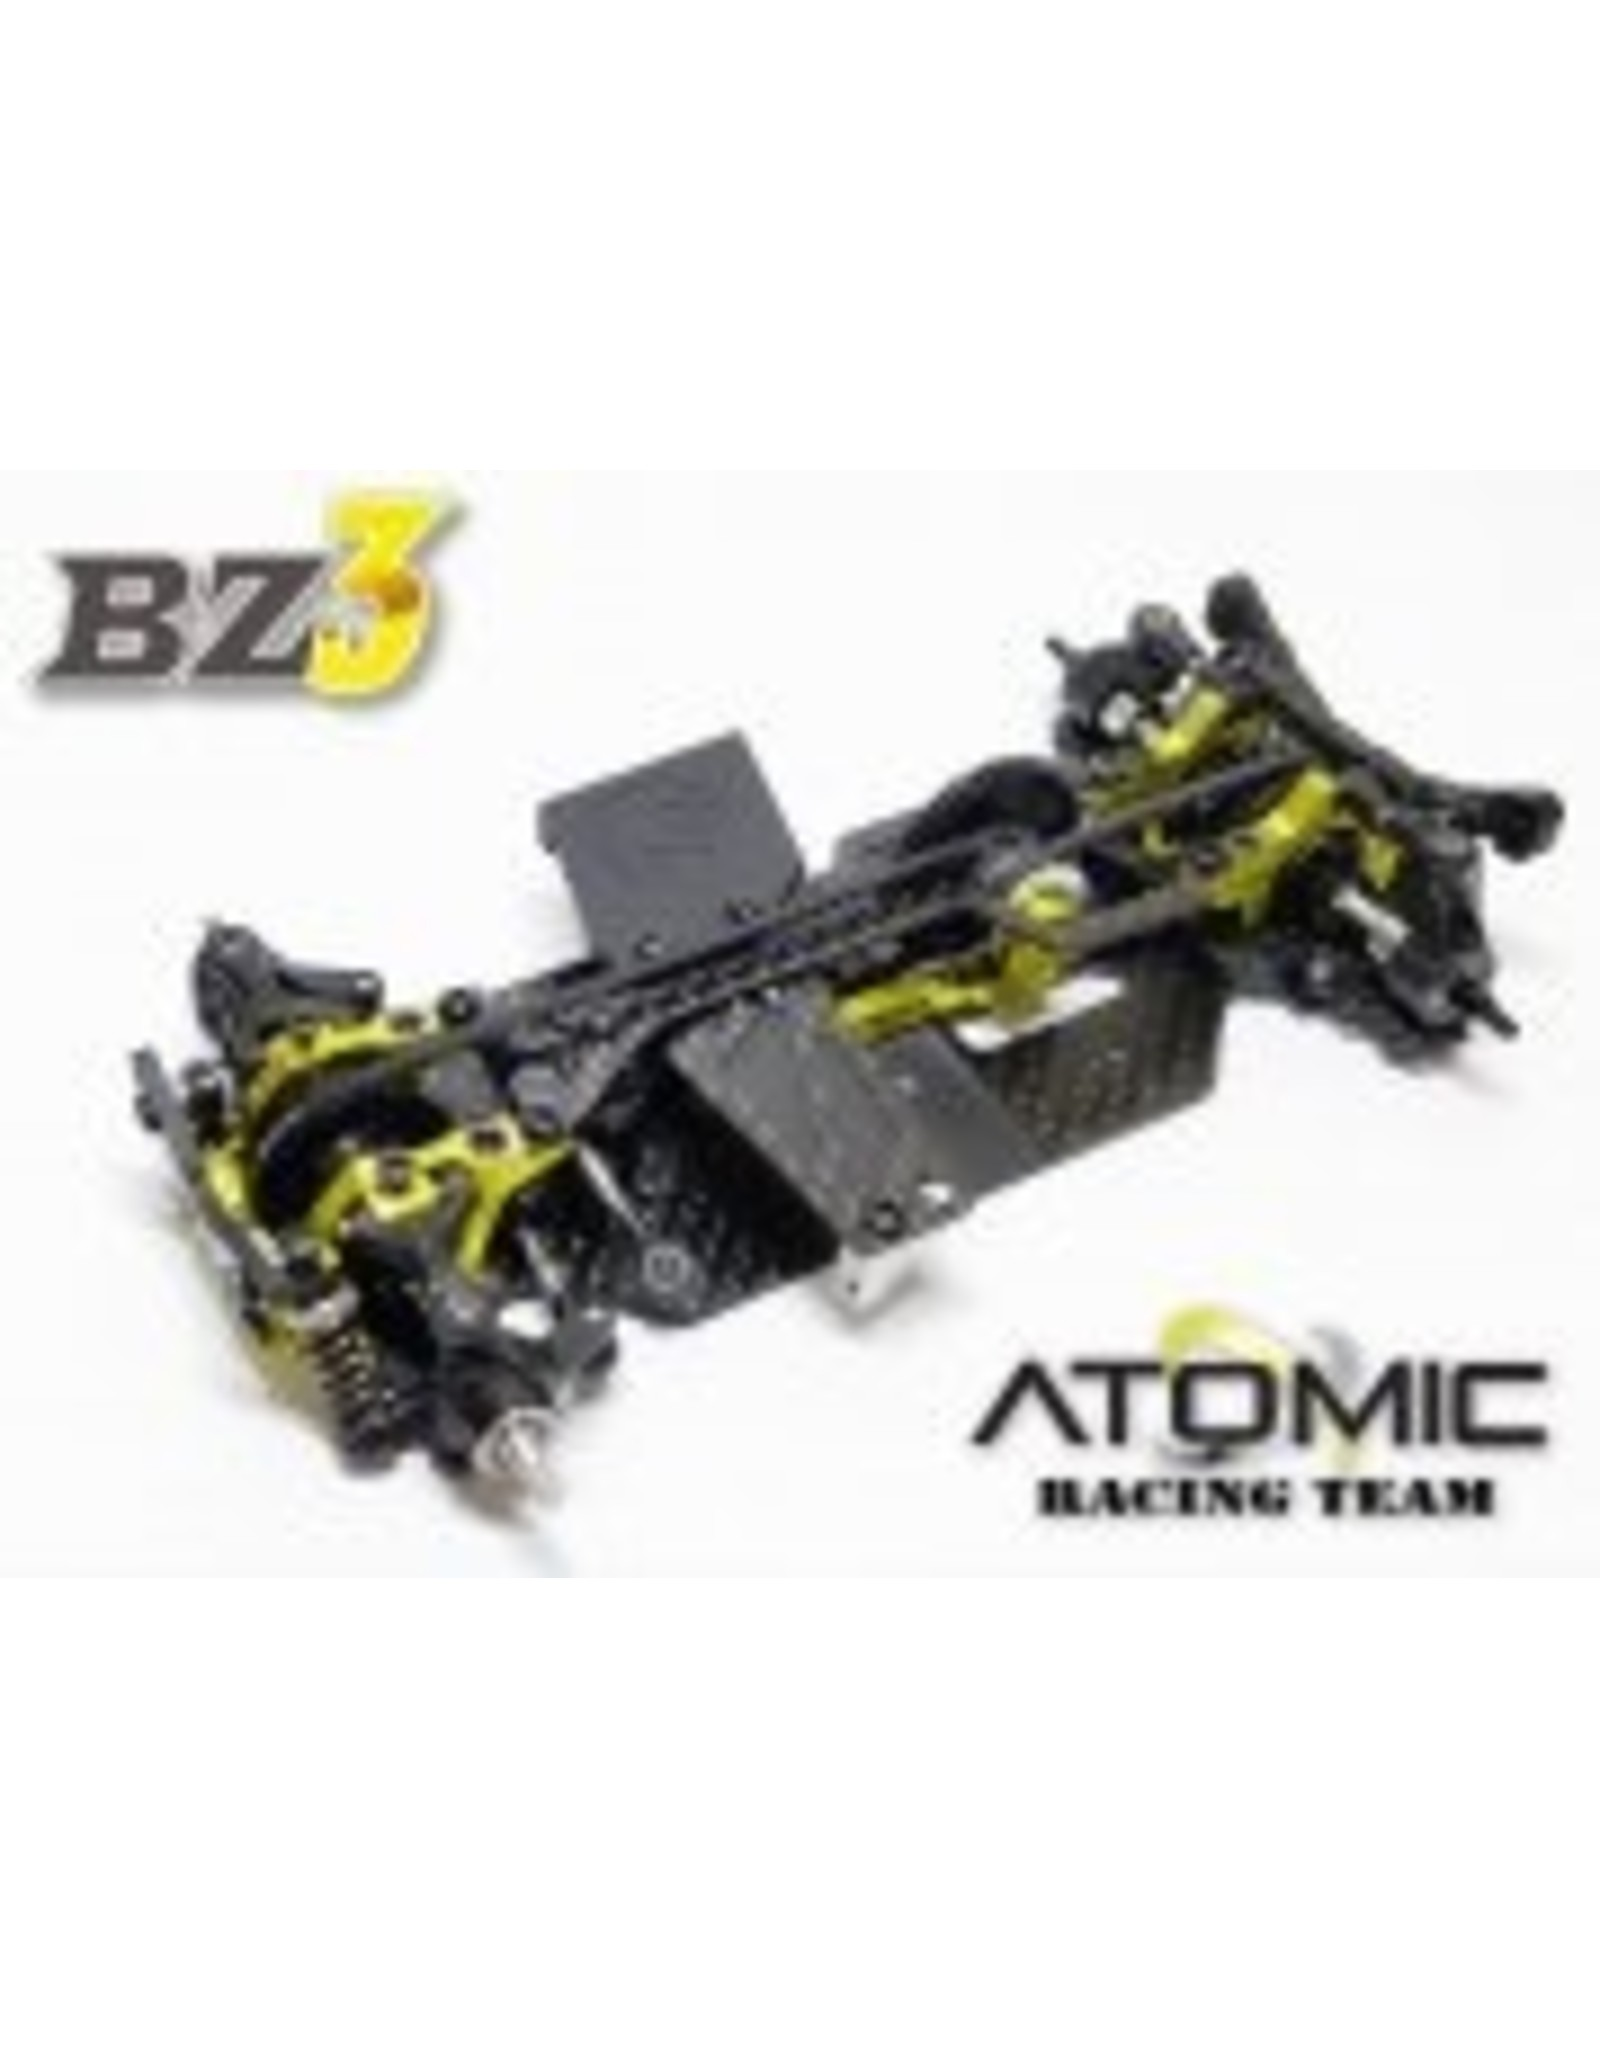 Atomic BZ3 Chassis Kit (No ESC/Servo/Motor) (BZ3-KIT)